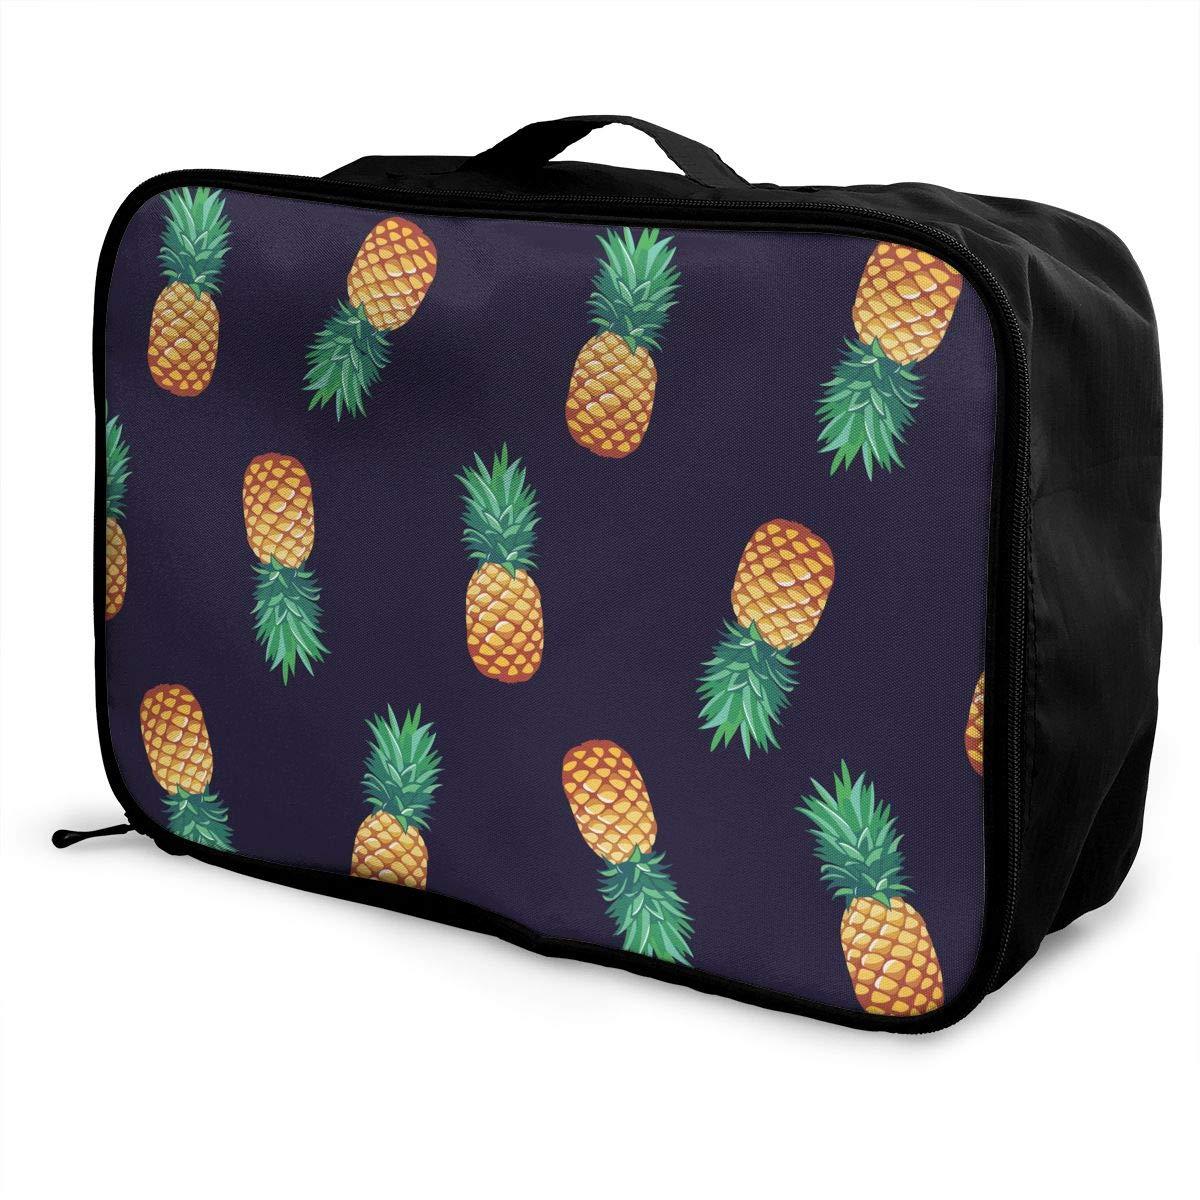 Pineapple Pattern Travel Duffel Bag Casual Large Capacity Portable Luggage Bag Suitcase Storage Bag Luggage Packing Tote Bag Weekend Trip